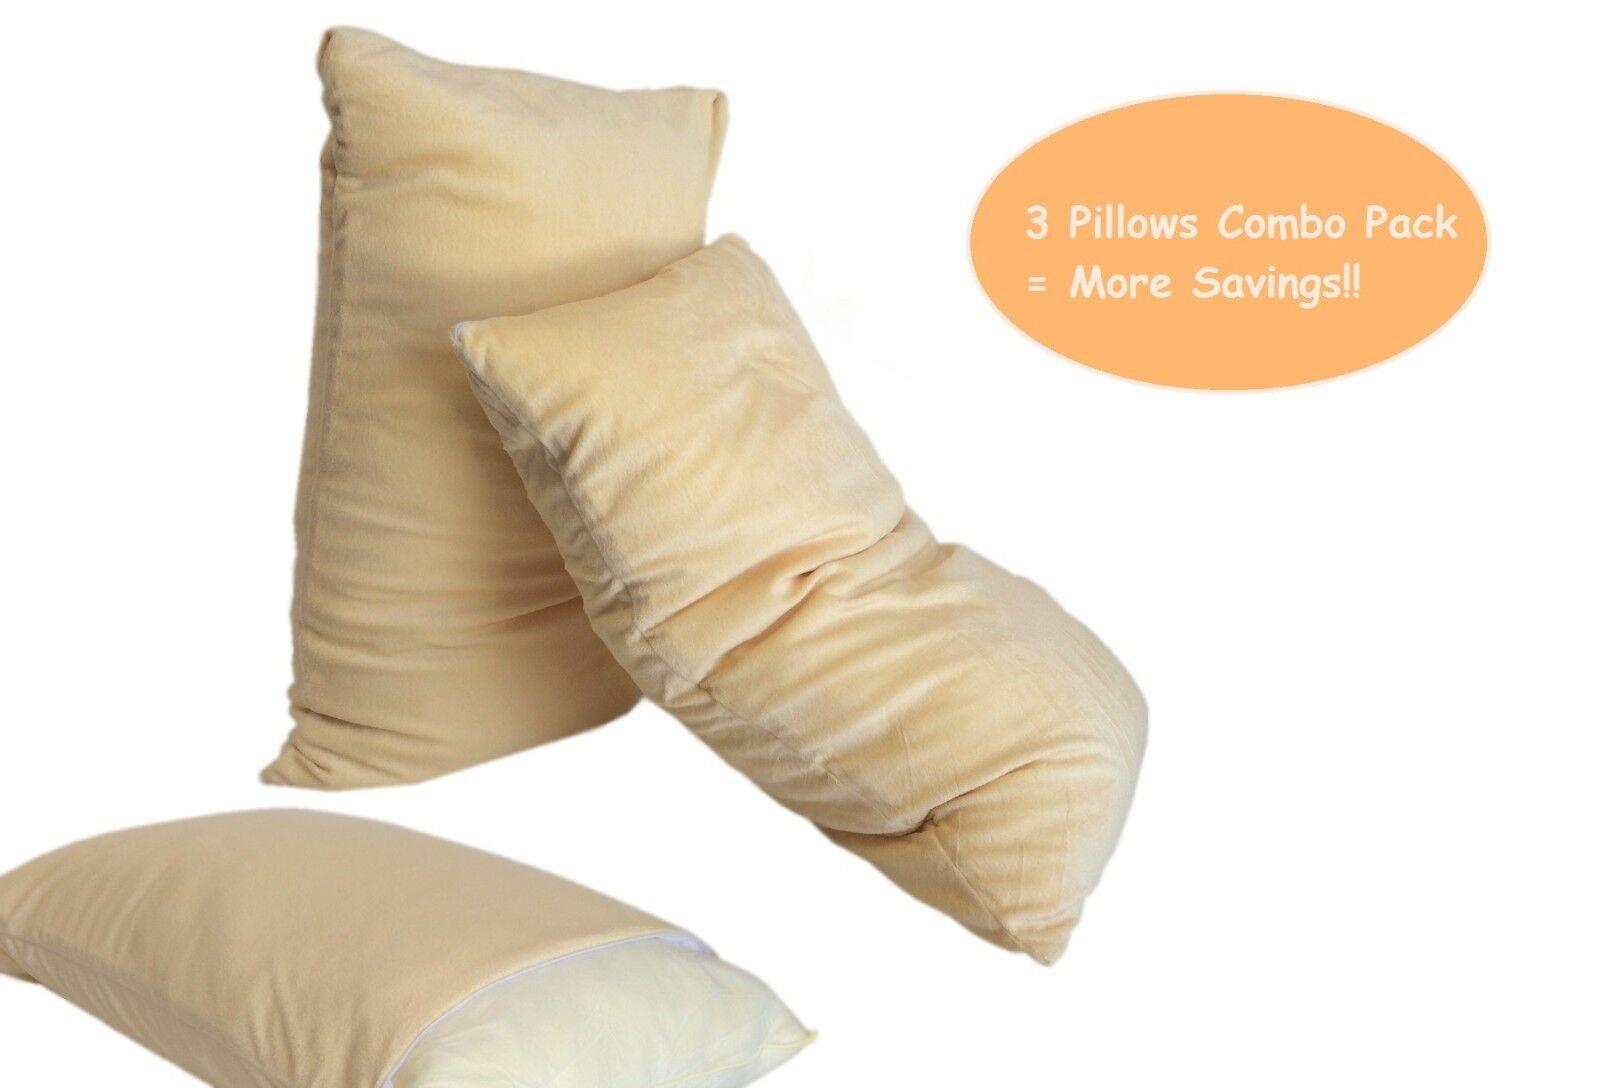 3 MicroCushion Memory Foam Bed Queen Pillows + Beige Velour Plush Comfort Cases